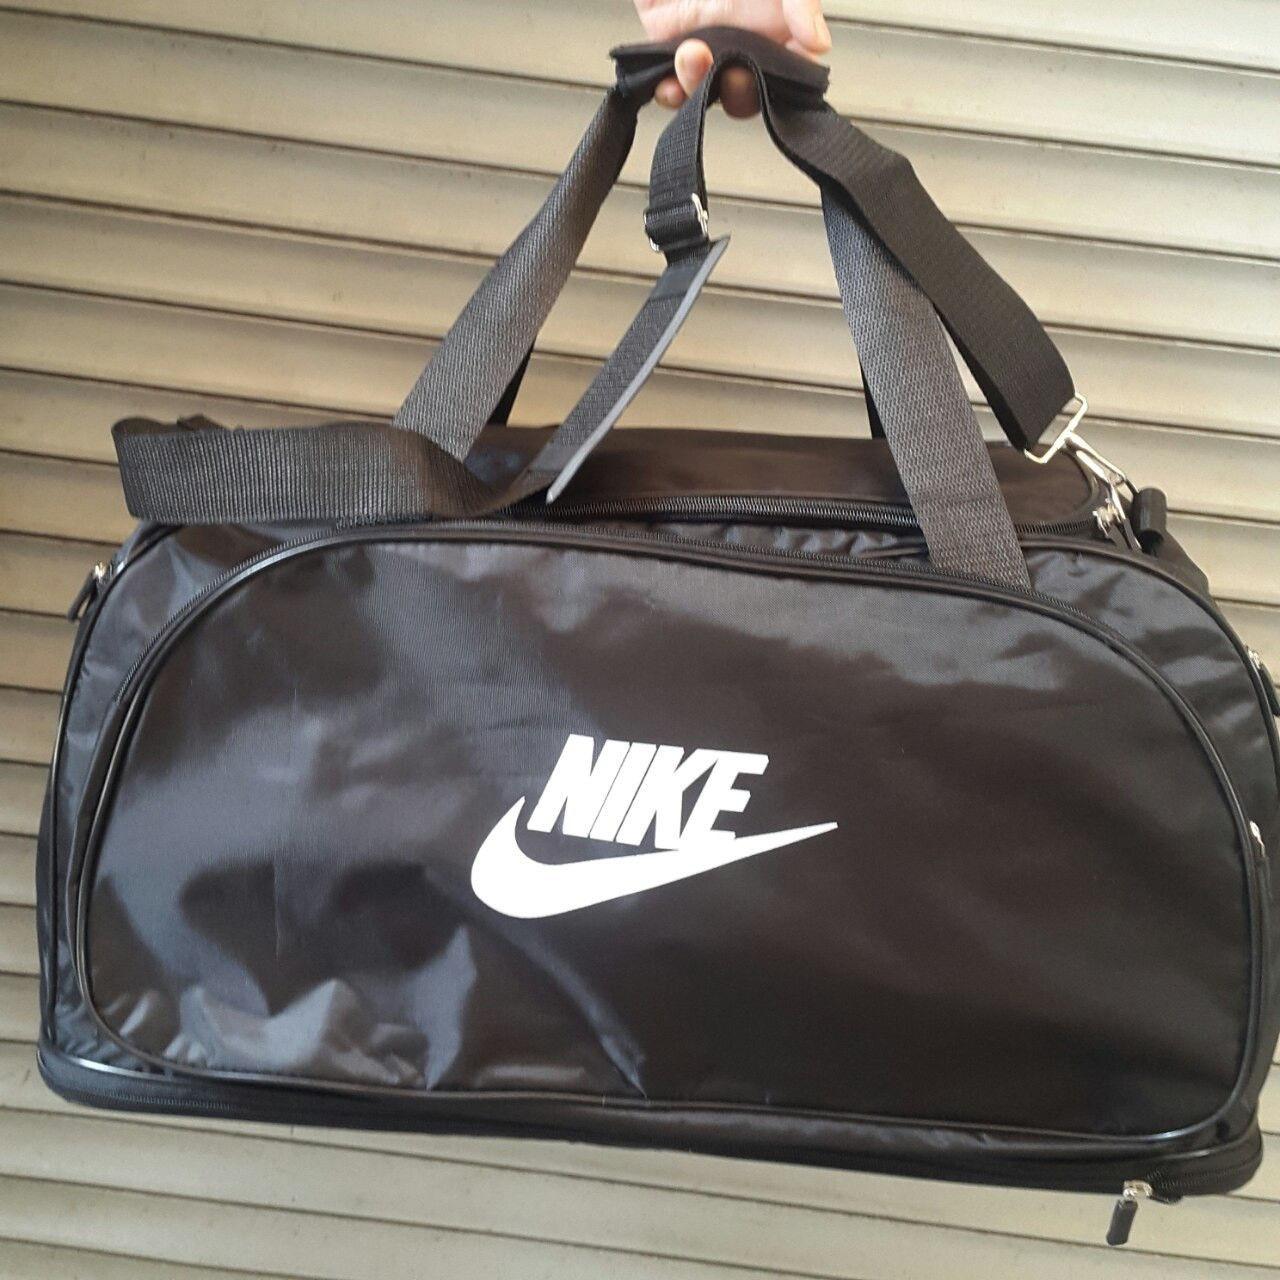 9fa8c425ce07e Сумка дорожная, спортивная Nike, Найк чёрная (45*26): продажа, цена ...